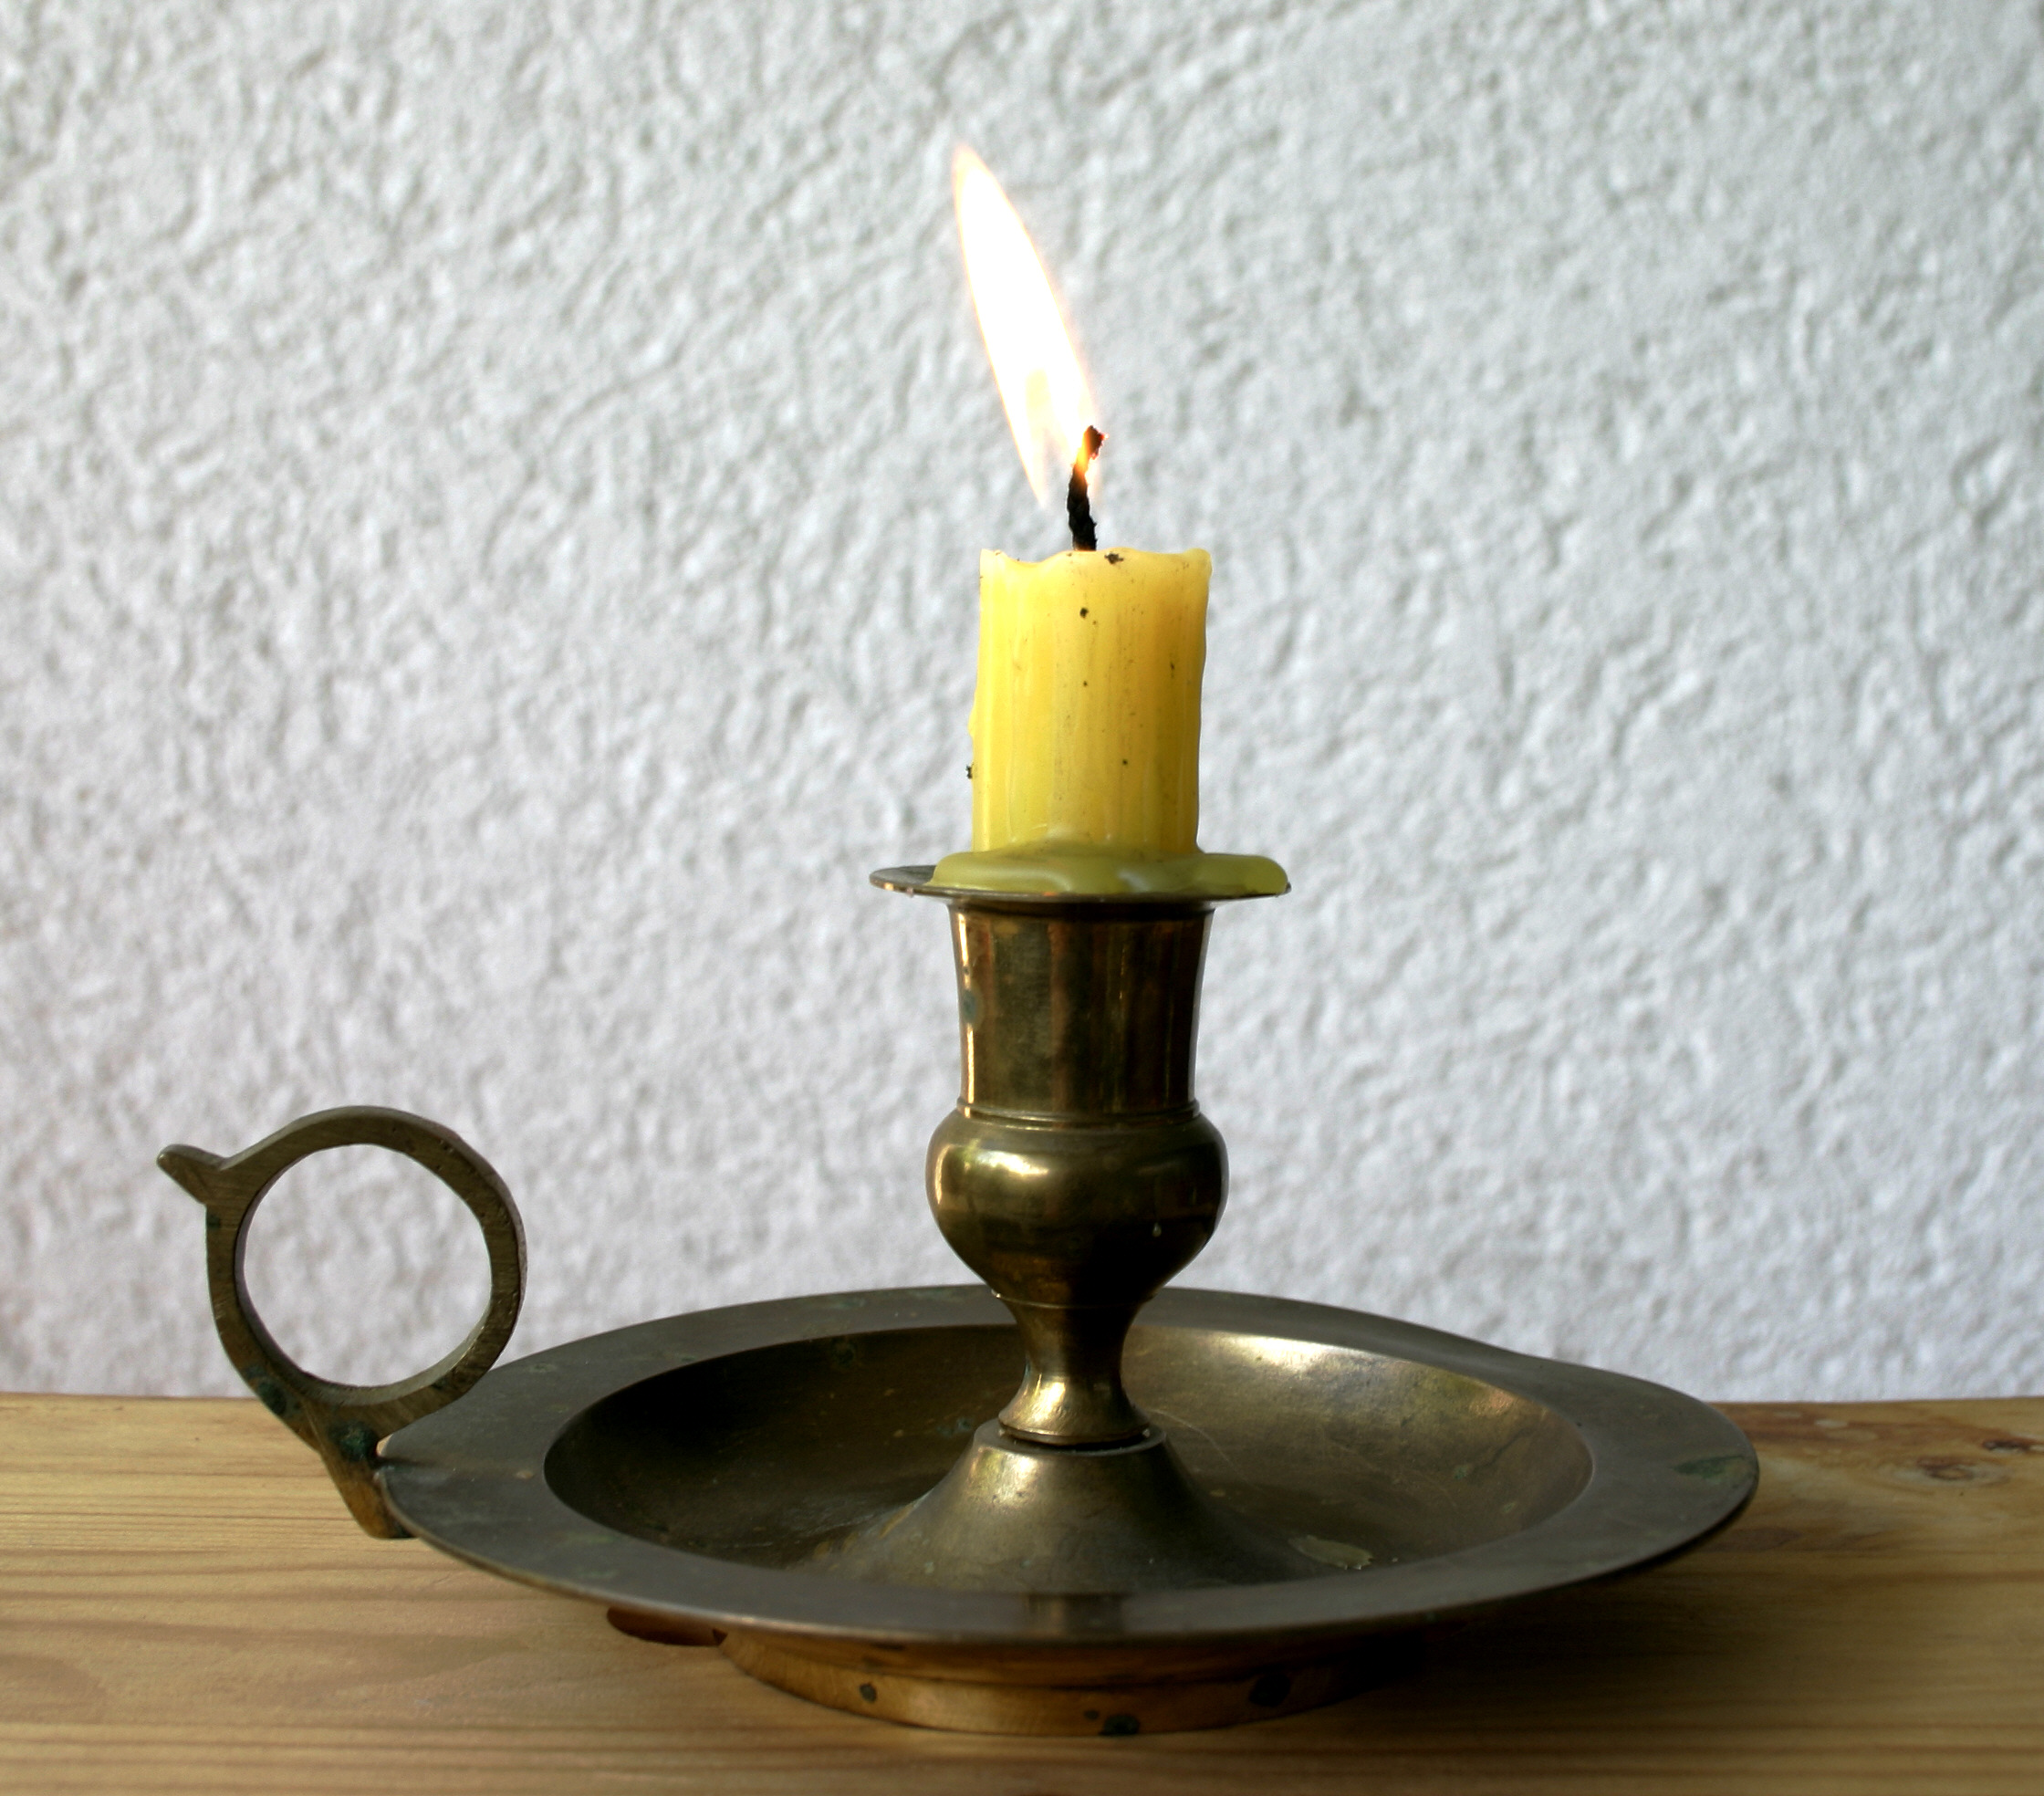 Candlestick Charts Live: - Bugia candlestick -.jpg - Wikimedia Commons,Chart